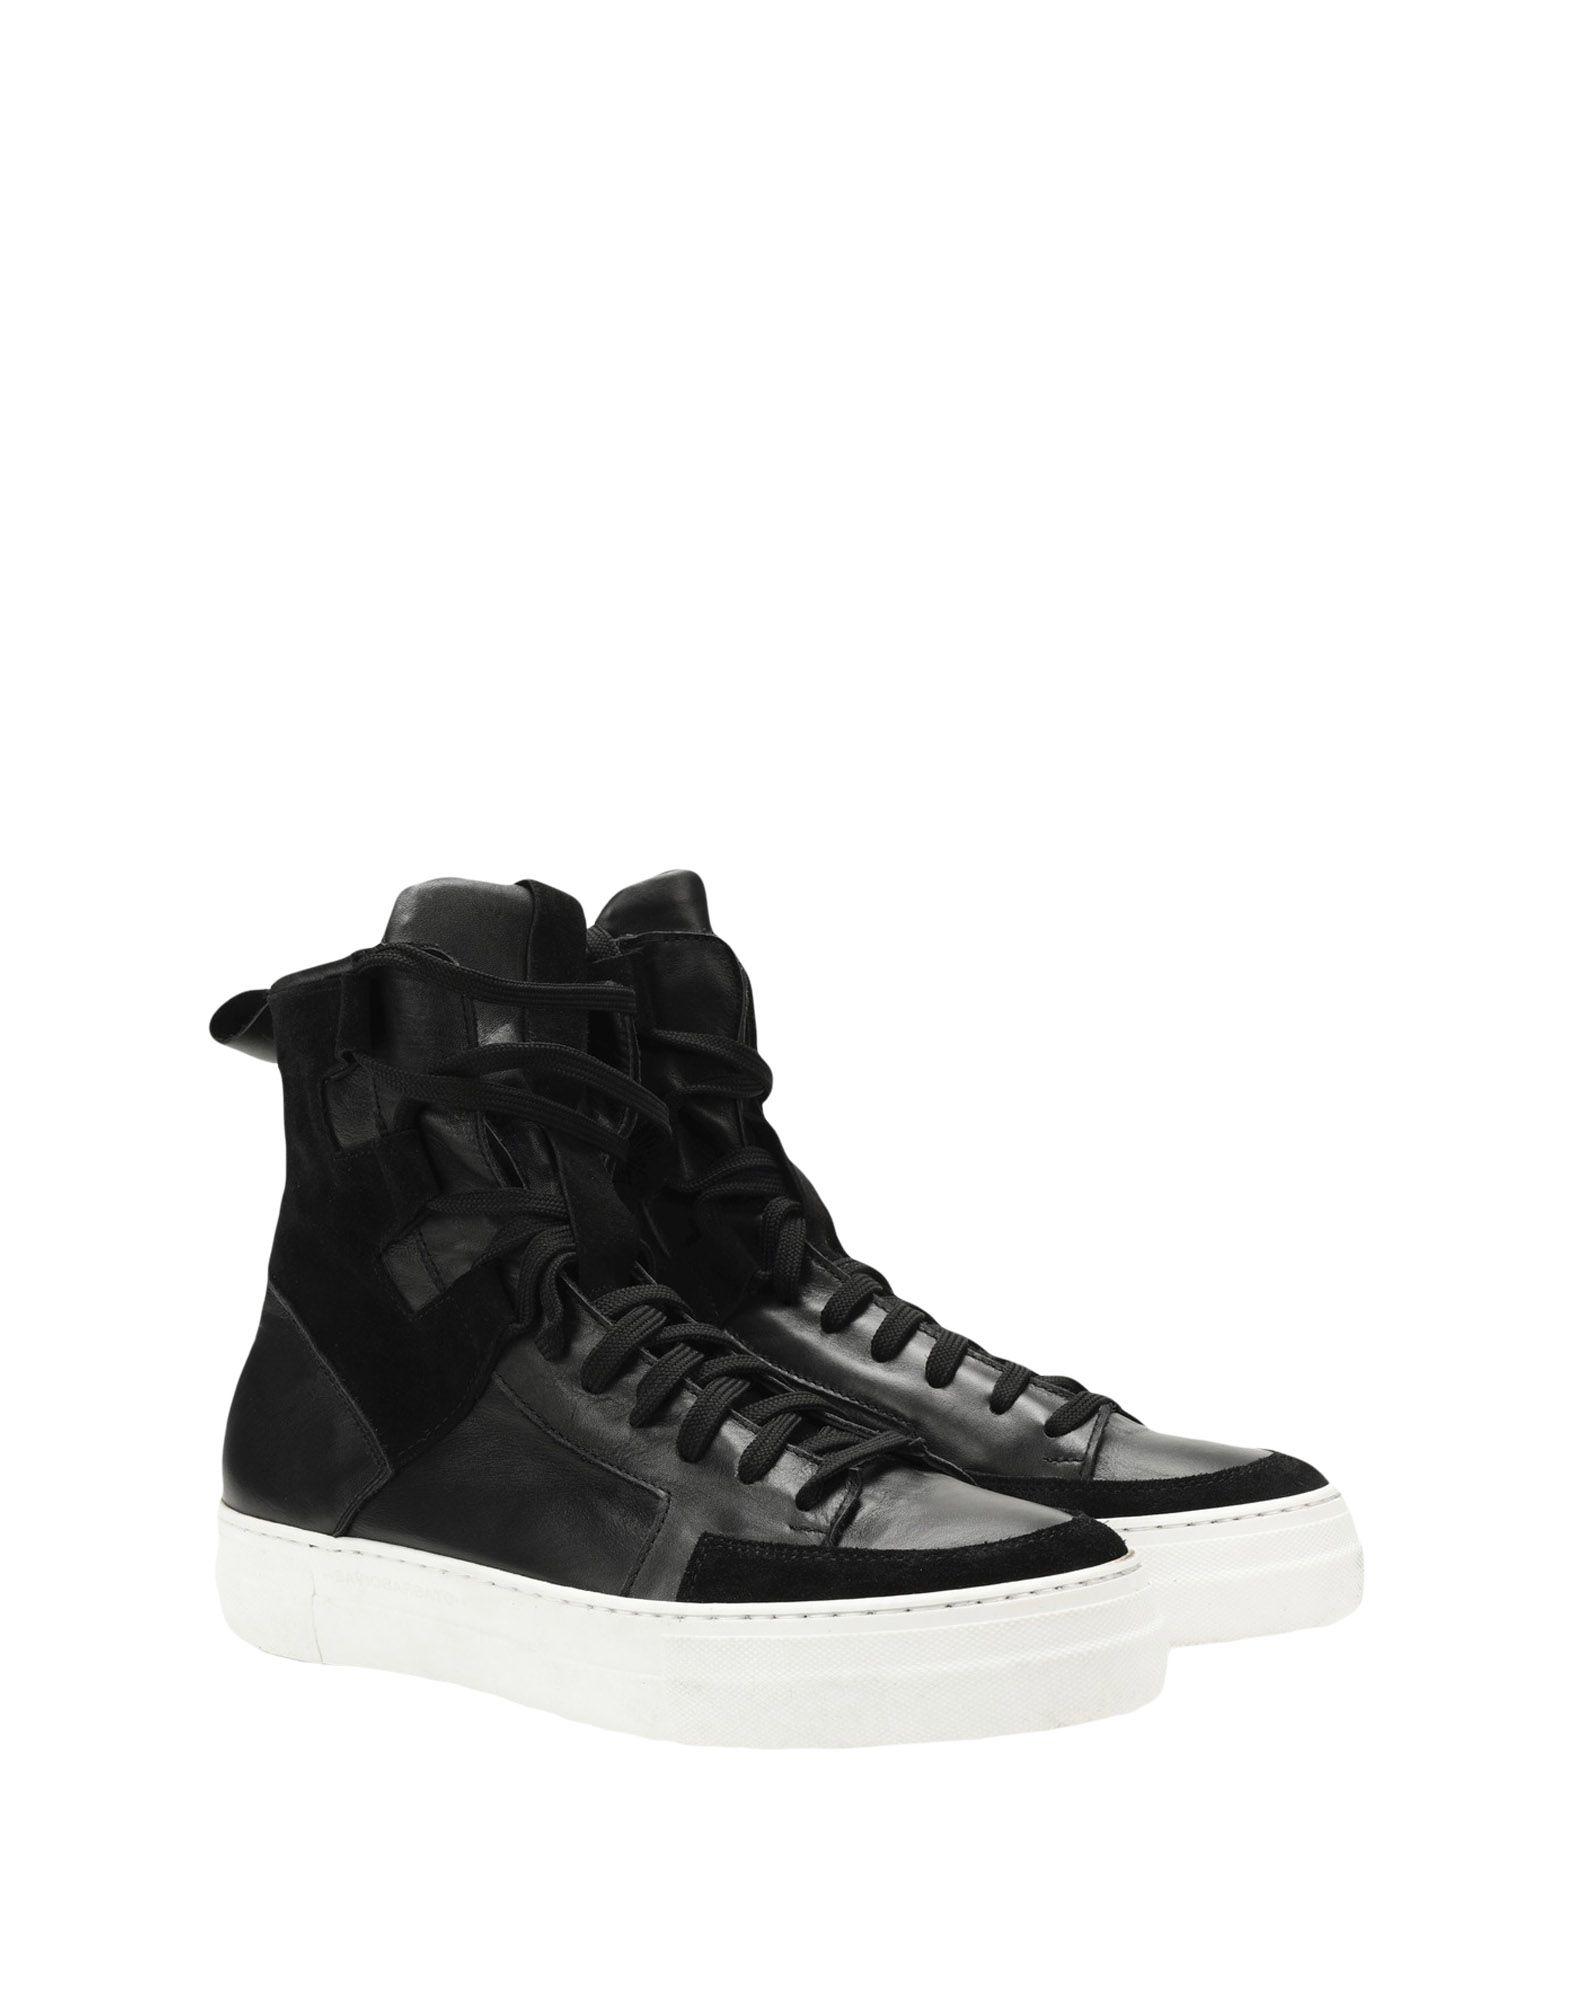 Savio 11540134IH Barbato Sneakers Herren  11540134IH Savio Gute Qualität beliebte Schuhe 1f4c11